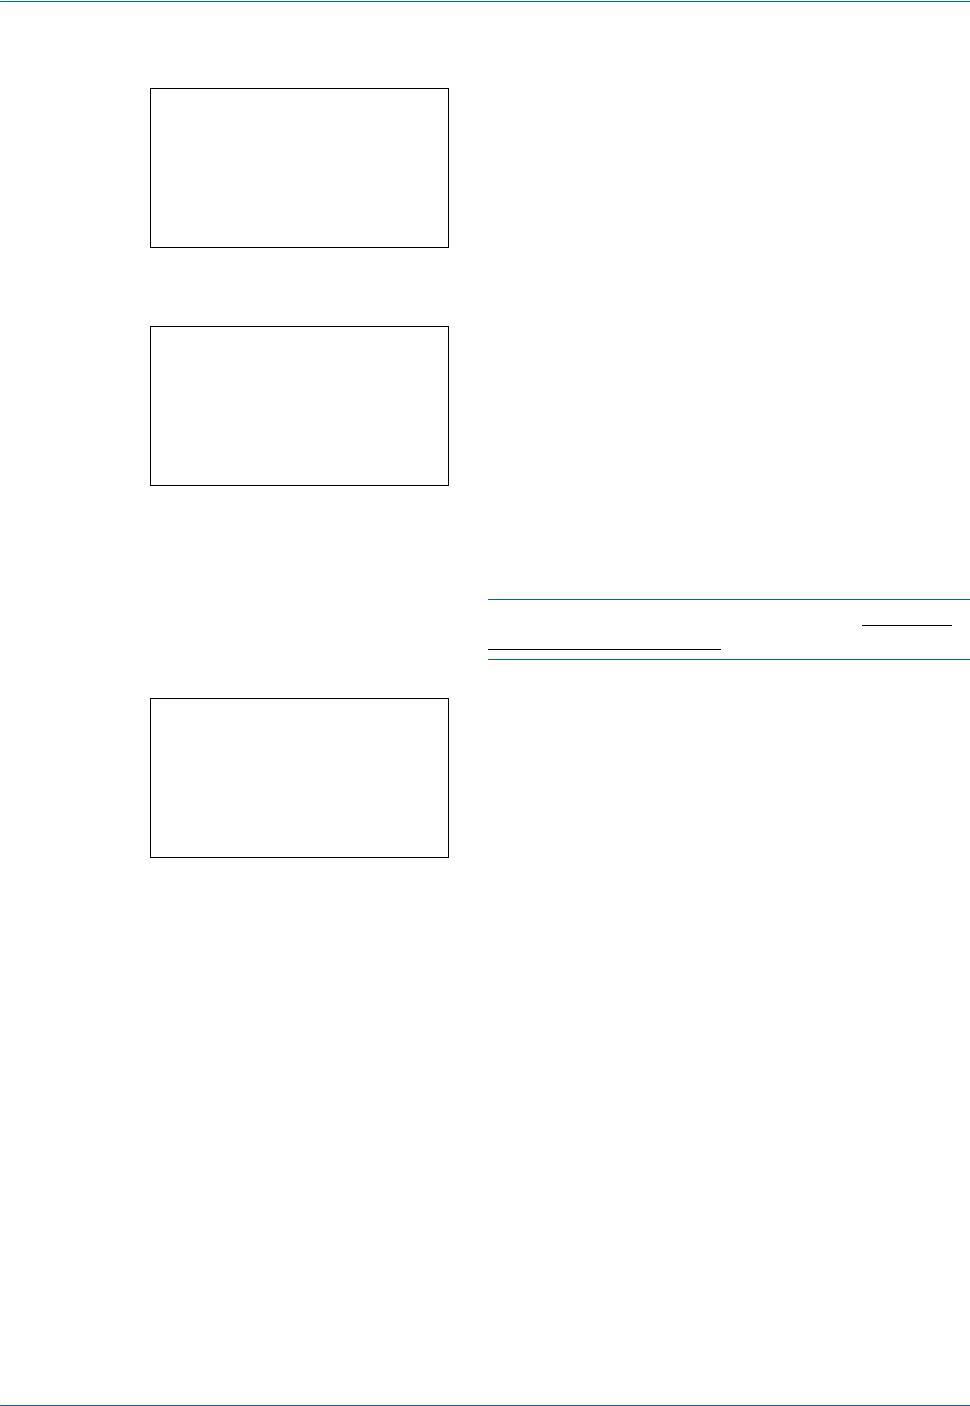 Kyocera FS-C2026MFP, FS-C2126MFP Displaying Send Job Log